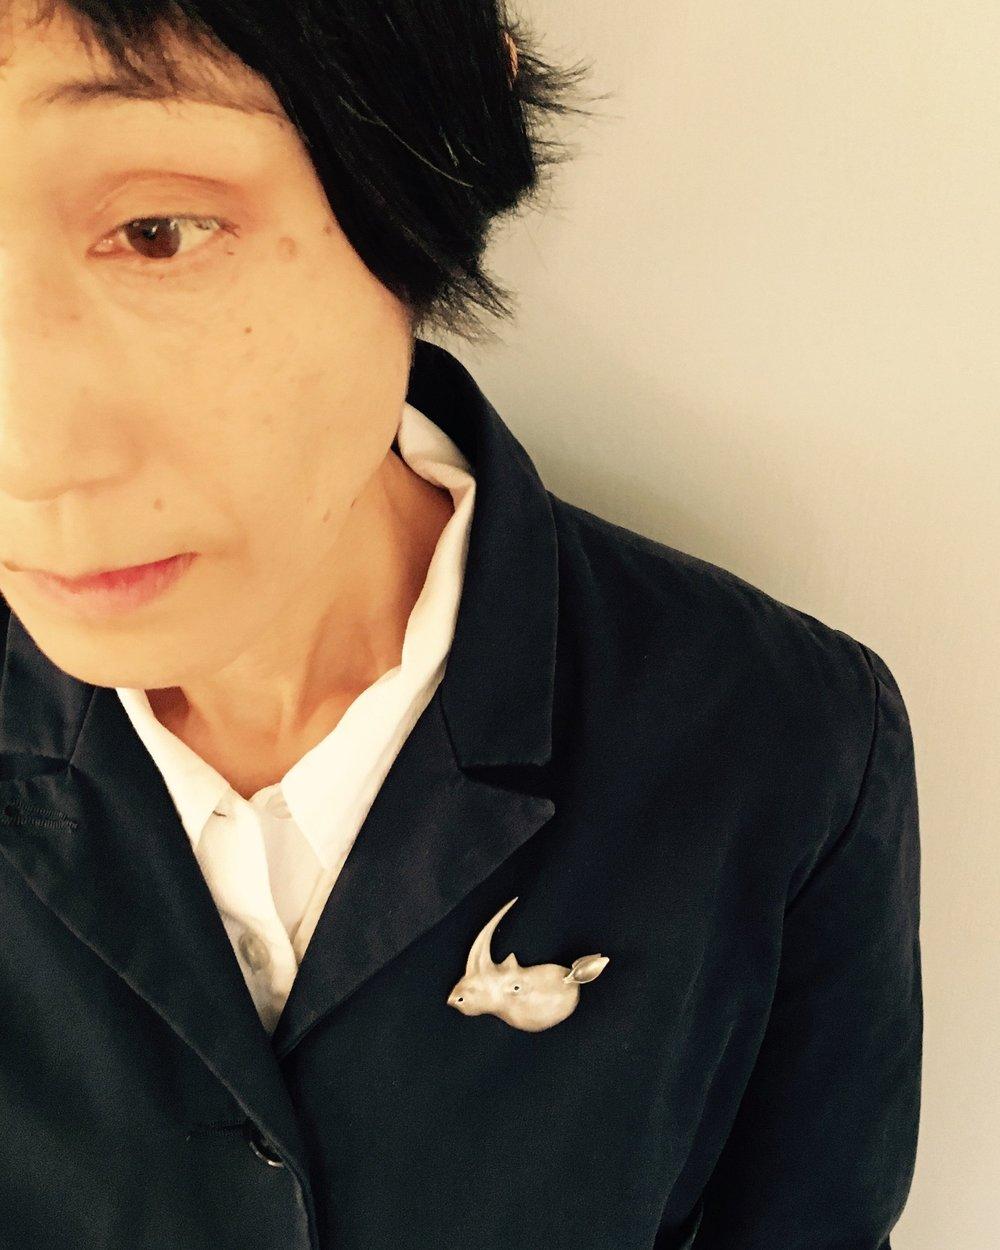 Rie wearing'My Horn is No Medicine: Rhino Head' brooch in silver, enamel paint, stainless steel pin size 44×39×10mmm